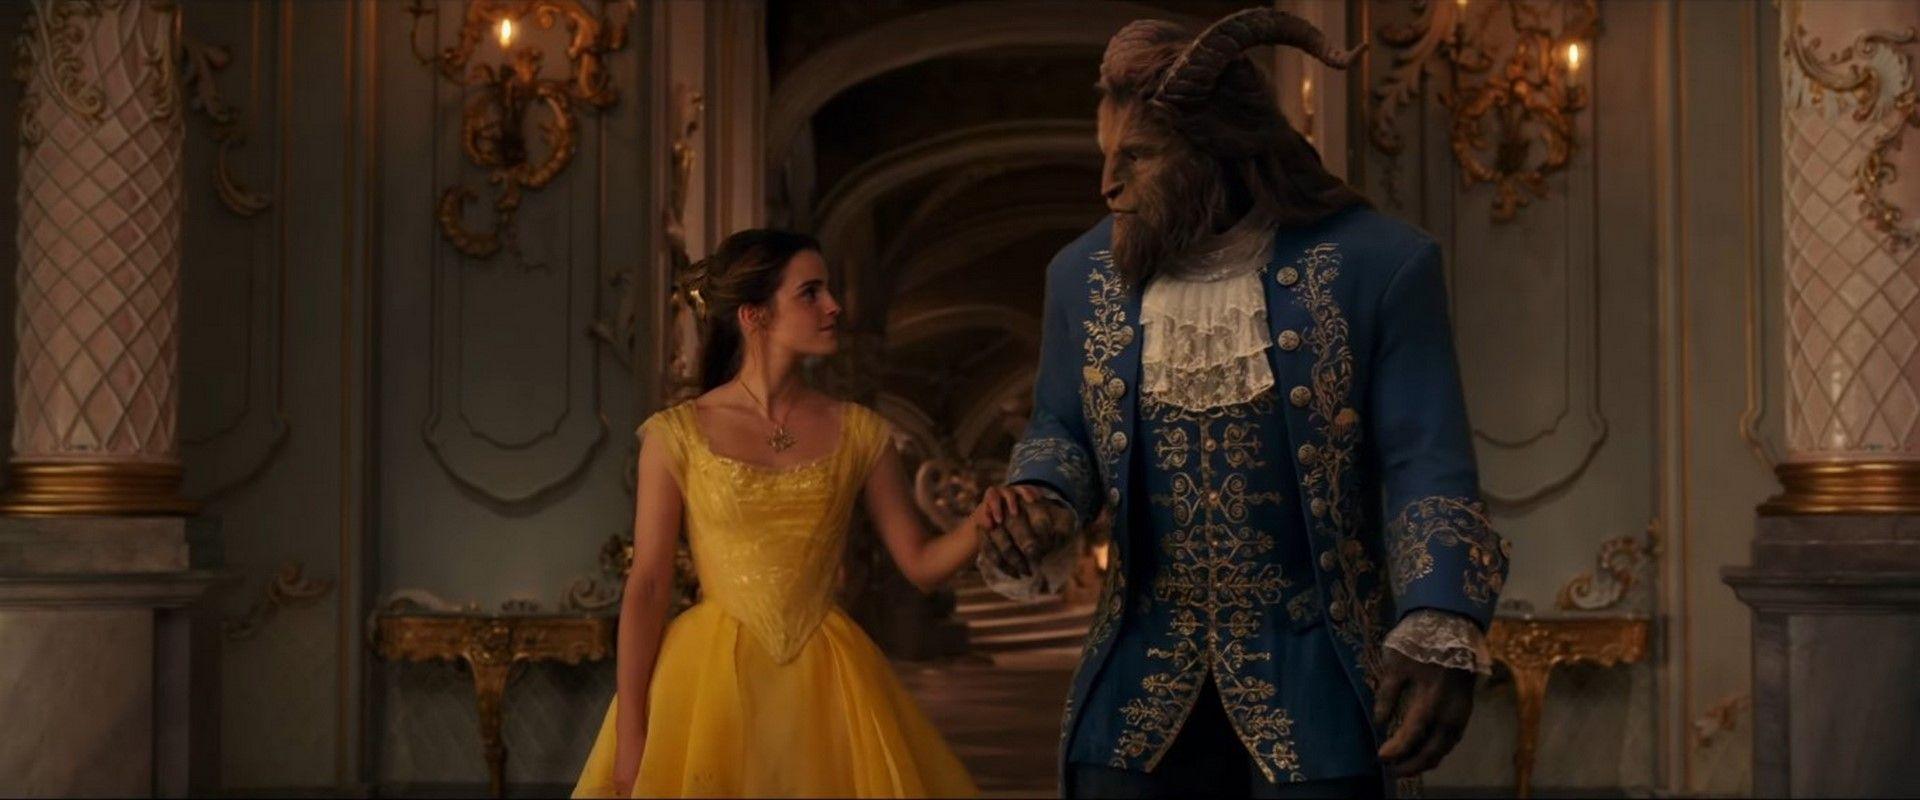 Belle Beast From Disney S Beauty The Beast 2017 Beauty The